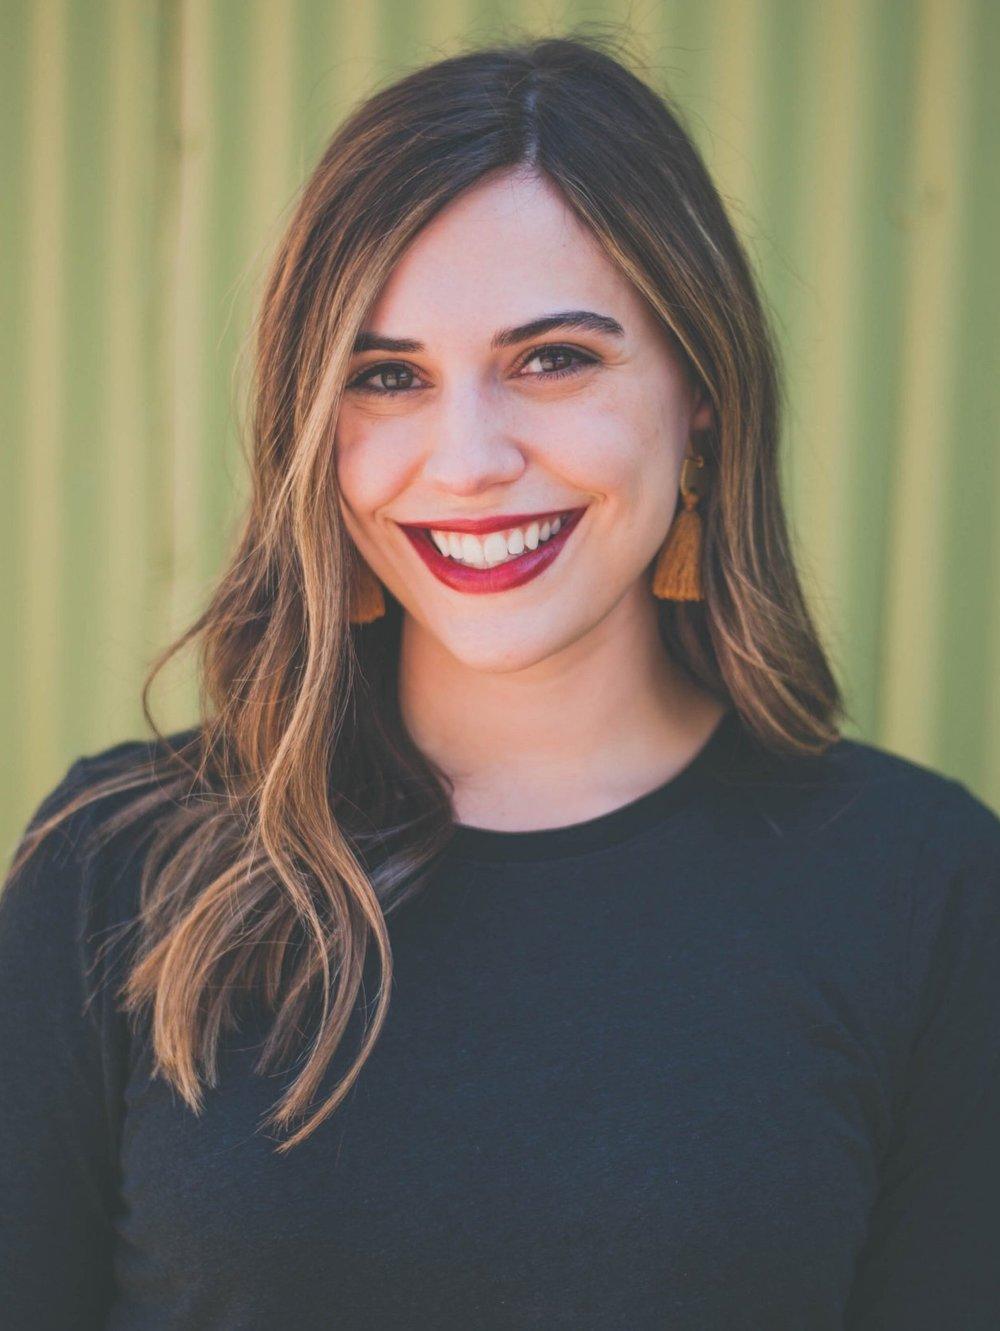 Candice Janowiak, Wedding & Event Coordinator